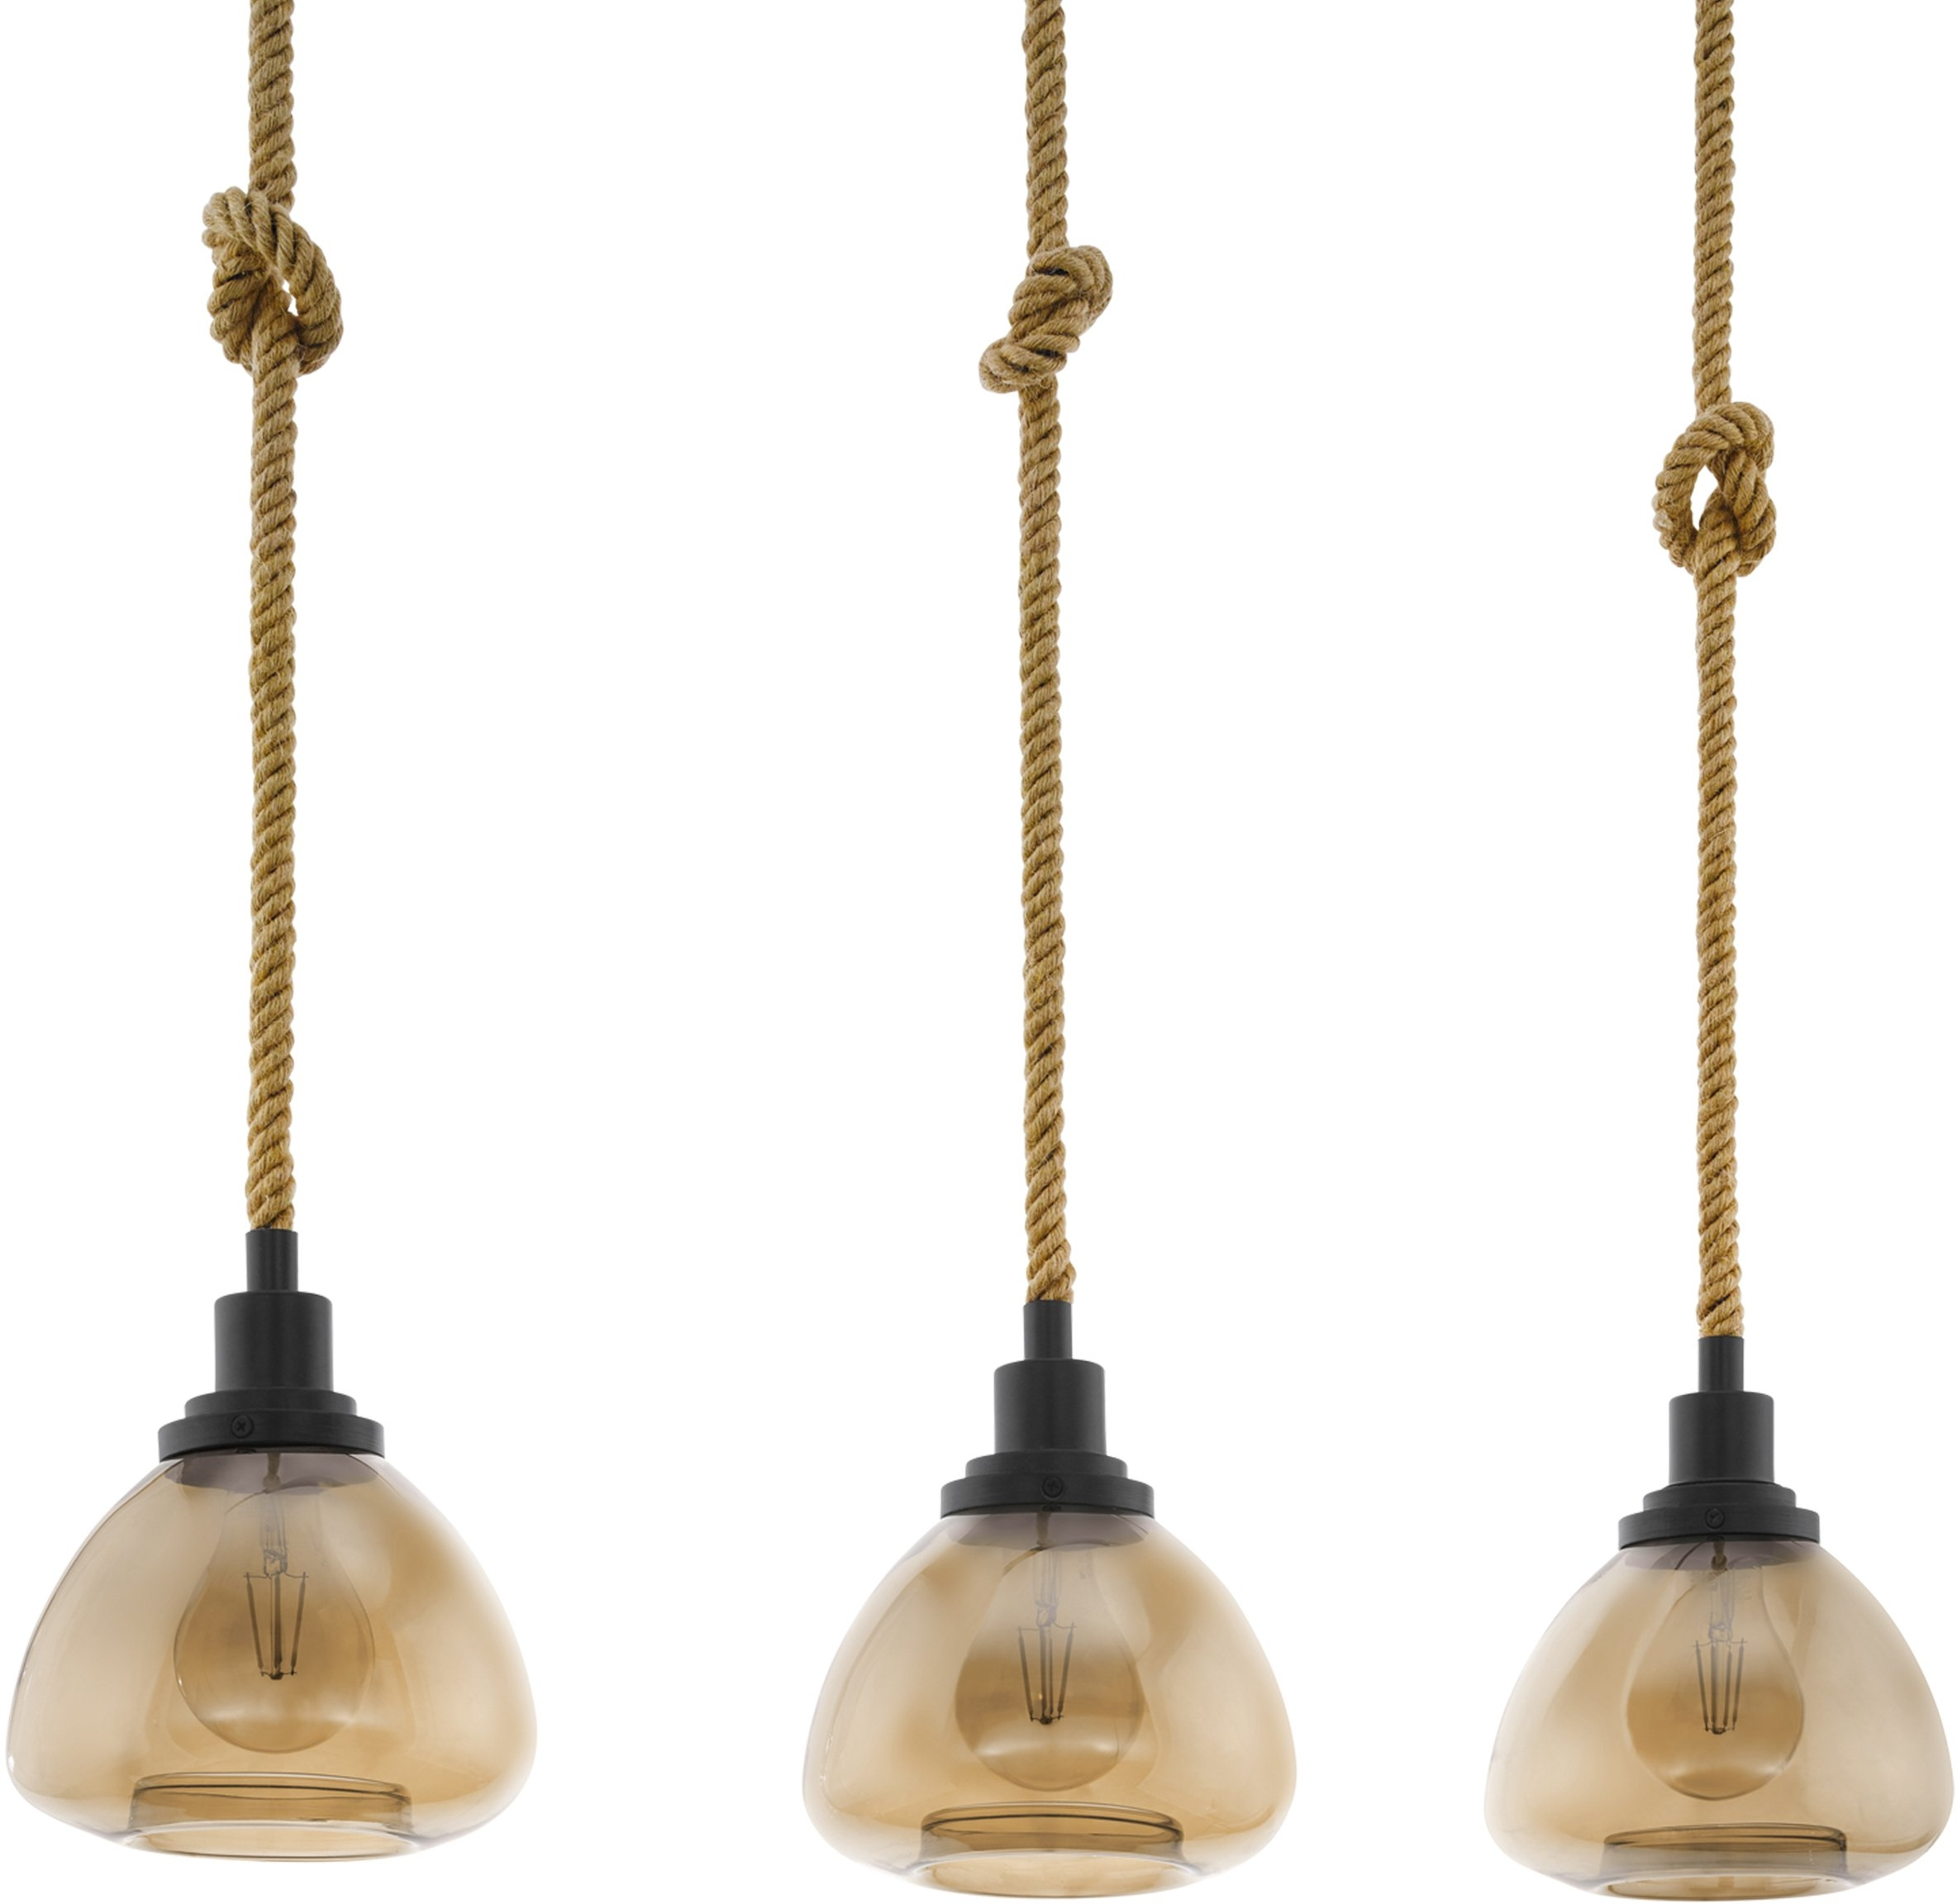 EGLO hanglamp RAMPSIDE Hanglicht, hanglamp veilig op otto.nl kopen